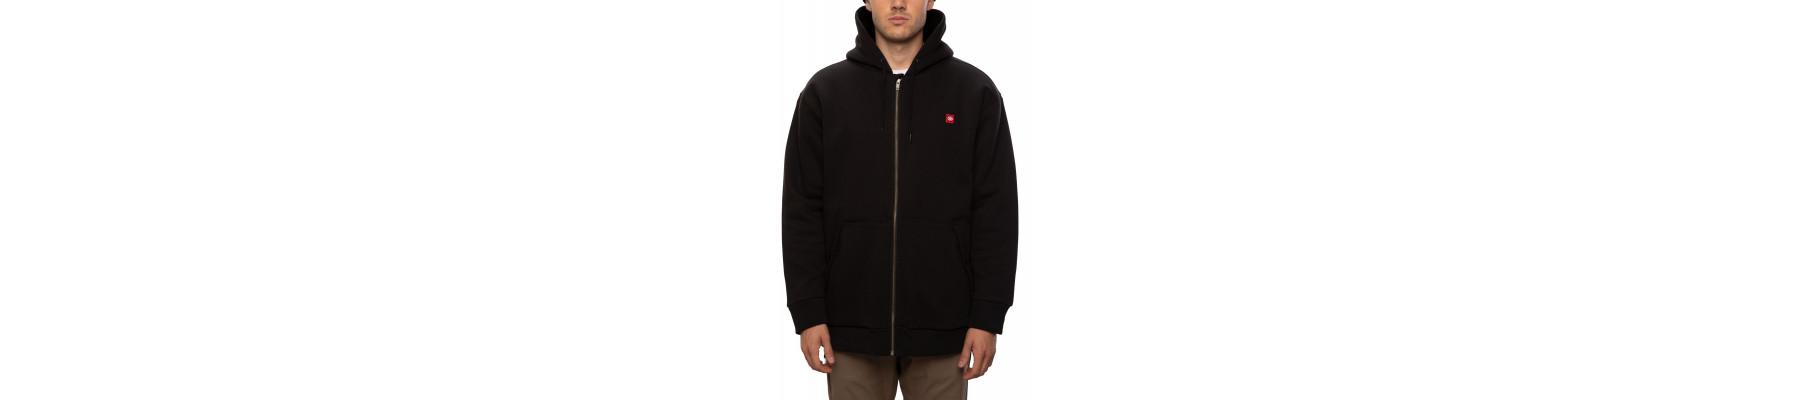 686 Sherpa Lined Hooded Sweatshirt black